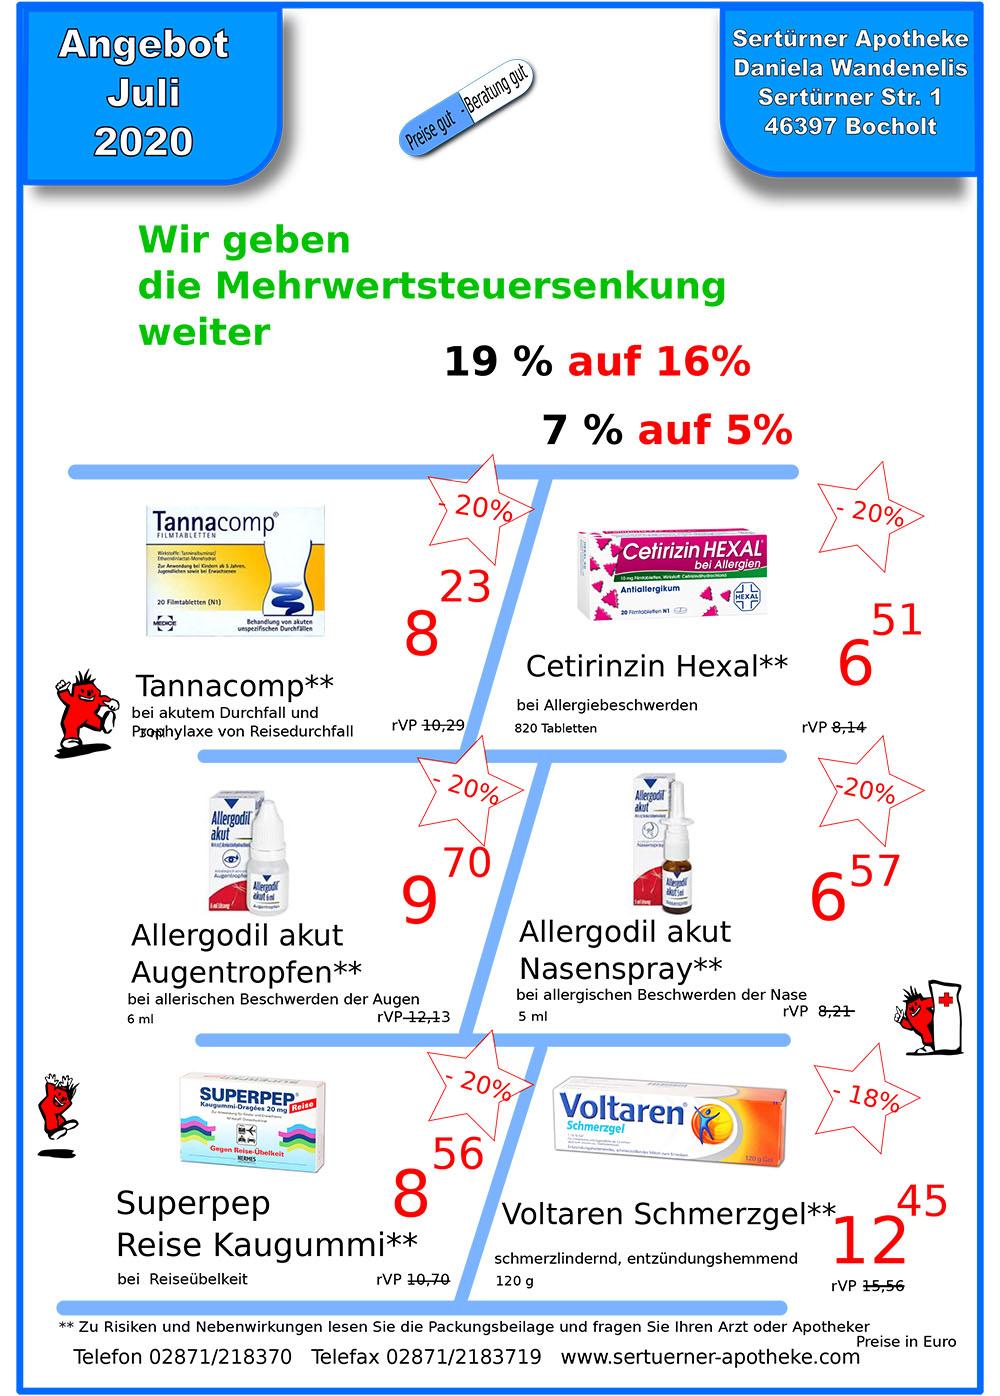 http://www.apotheken.de/fileadmin/clubarea/00000-Angebote/46397_4211_sertuerner_angebot_1.jpg